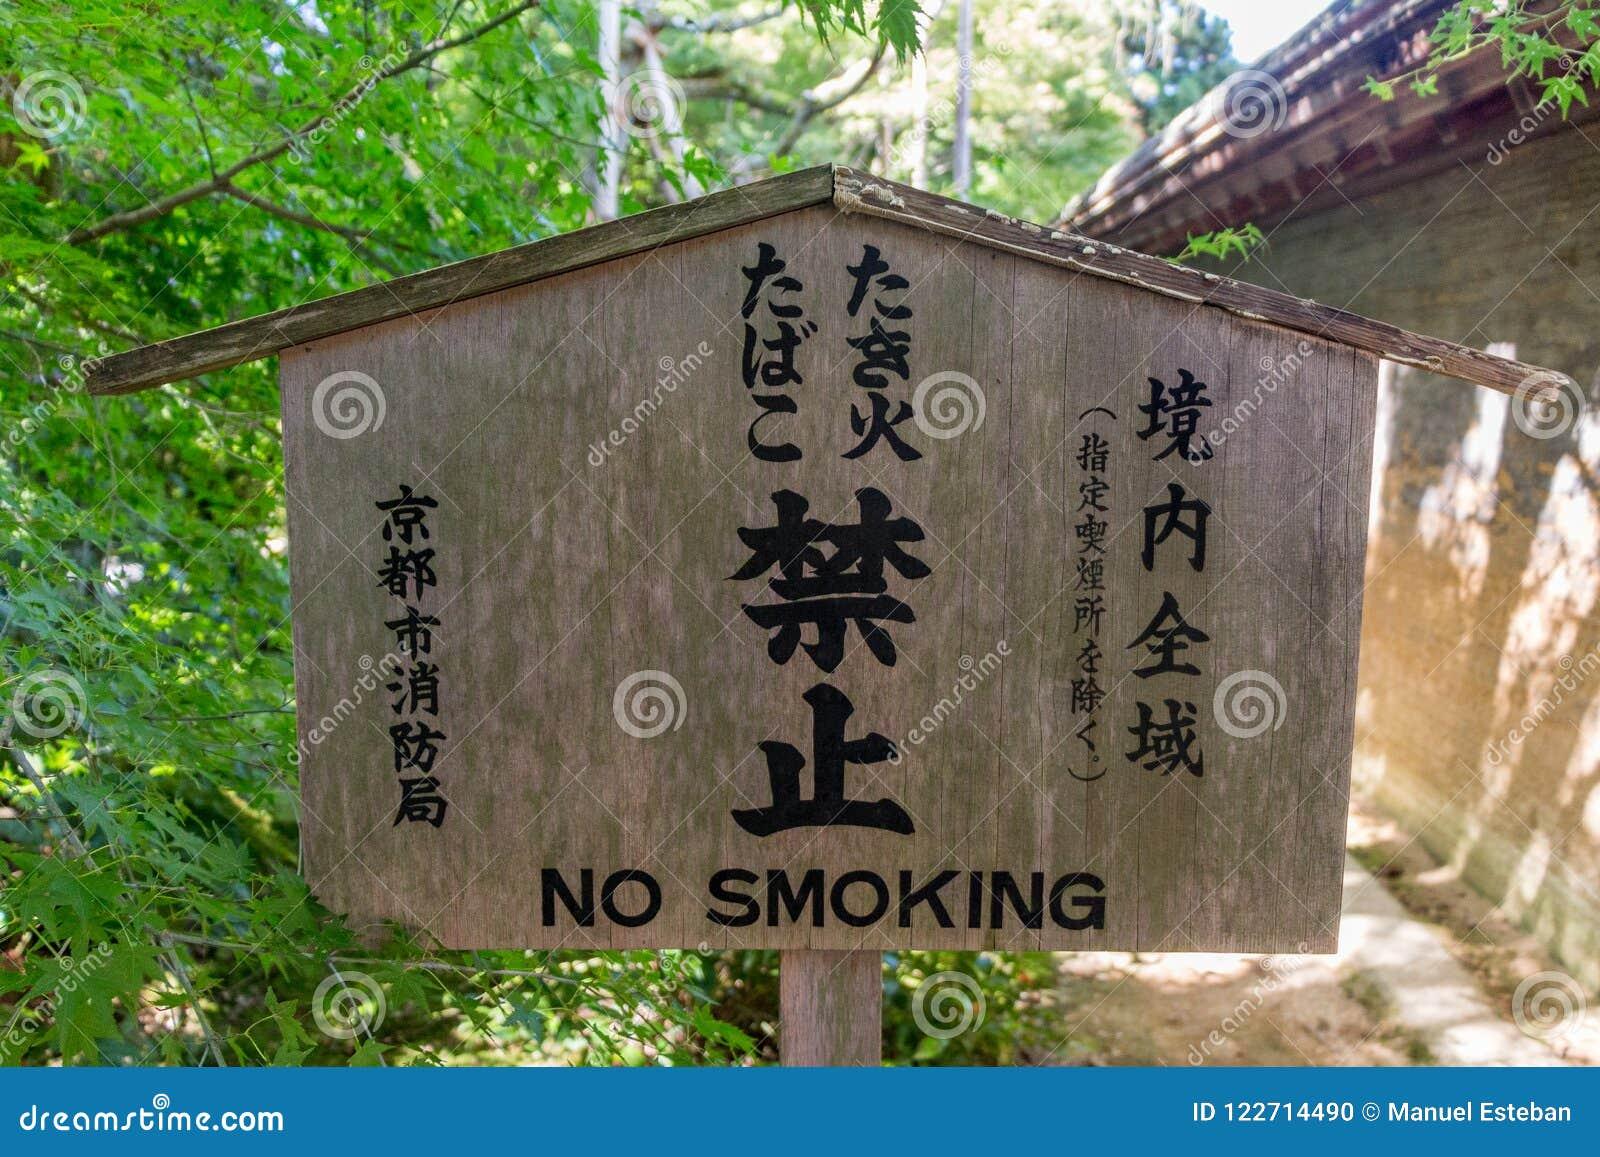 No Smoking Sign In English And Japanese Kyoto, Japan Stock